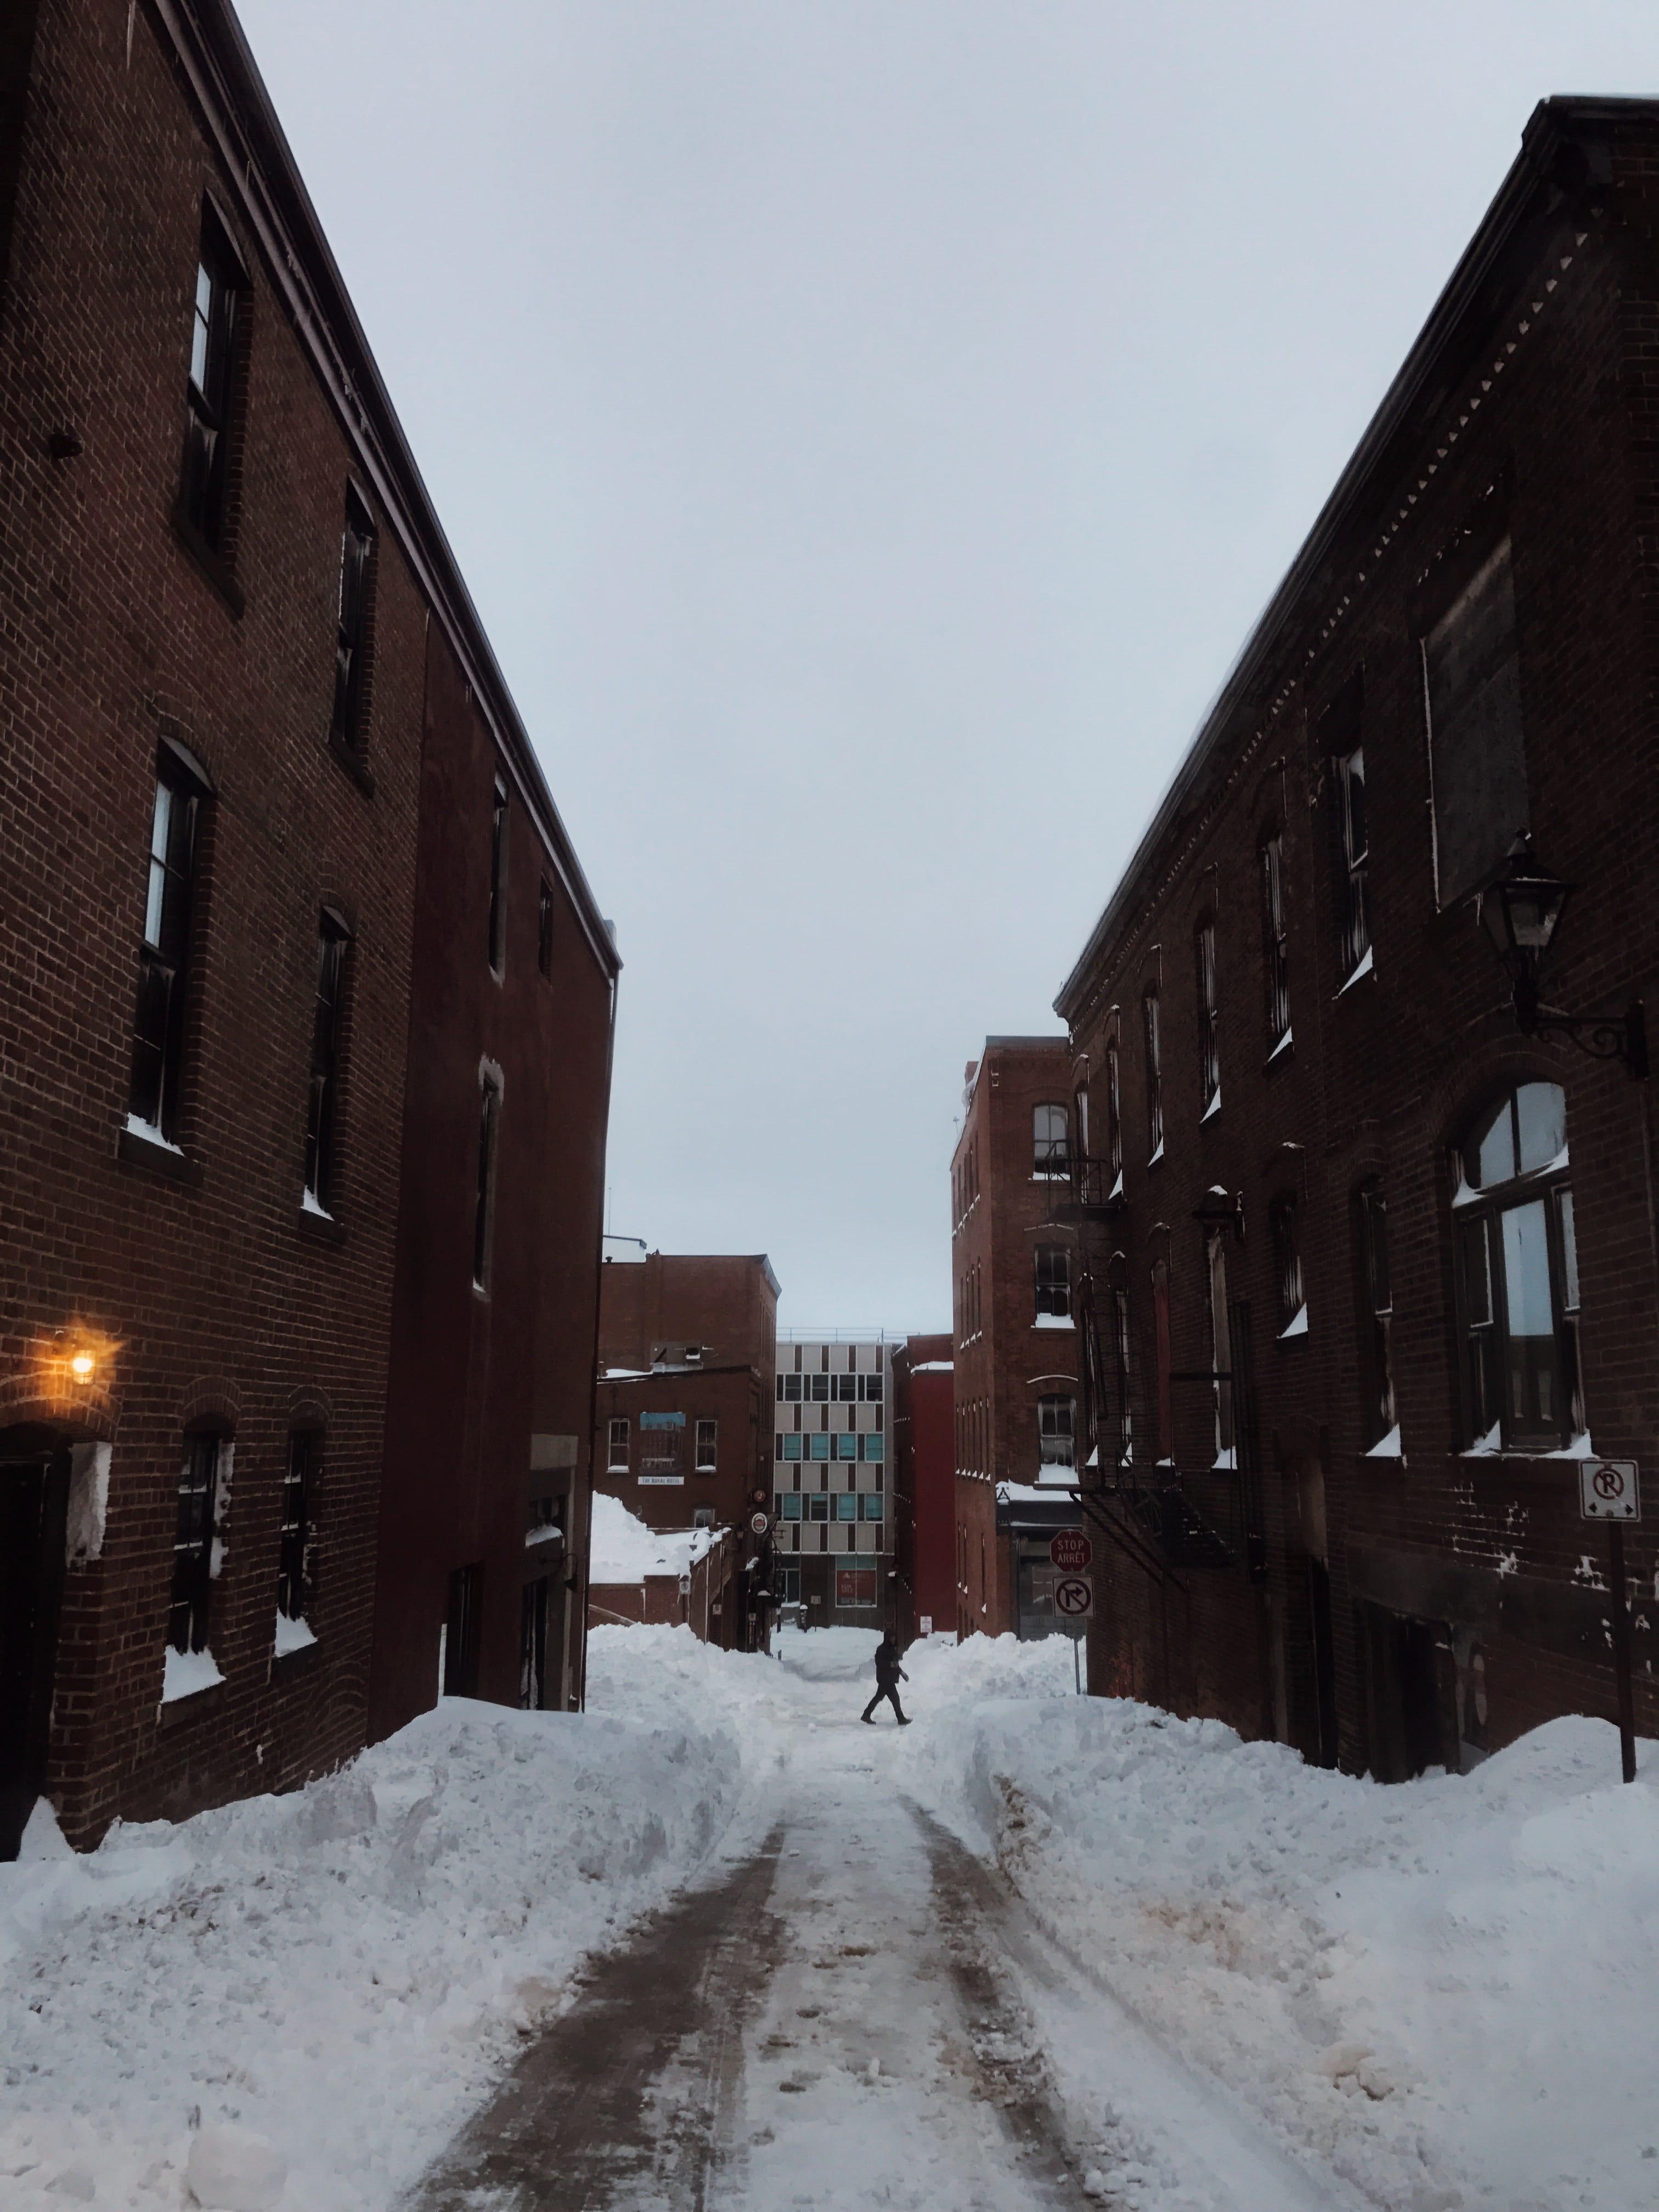 A photograph depicting Looking Down a Snowy Grannan Lane